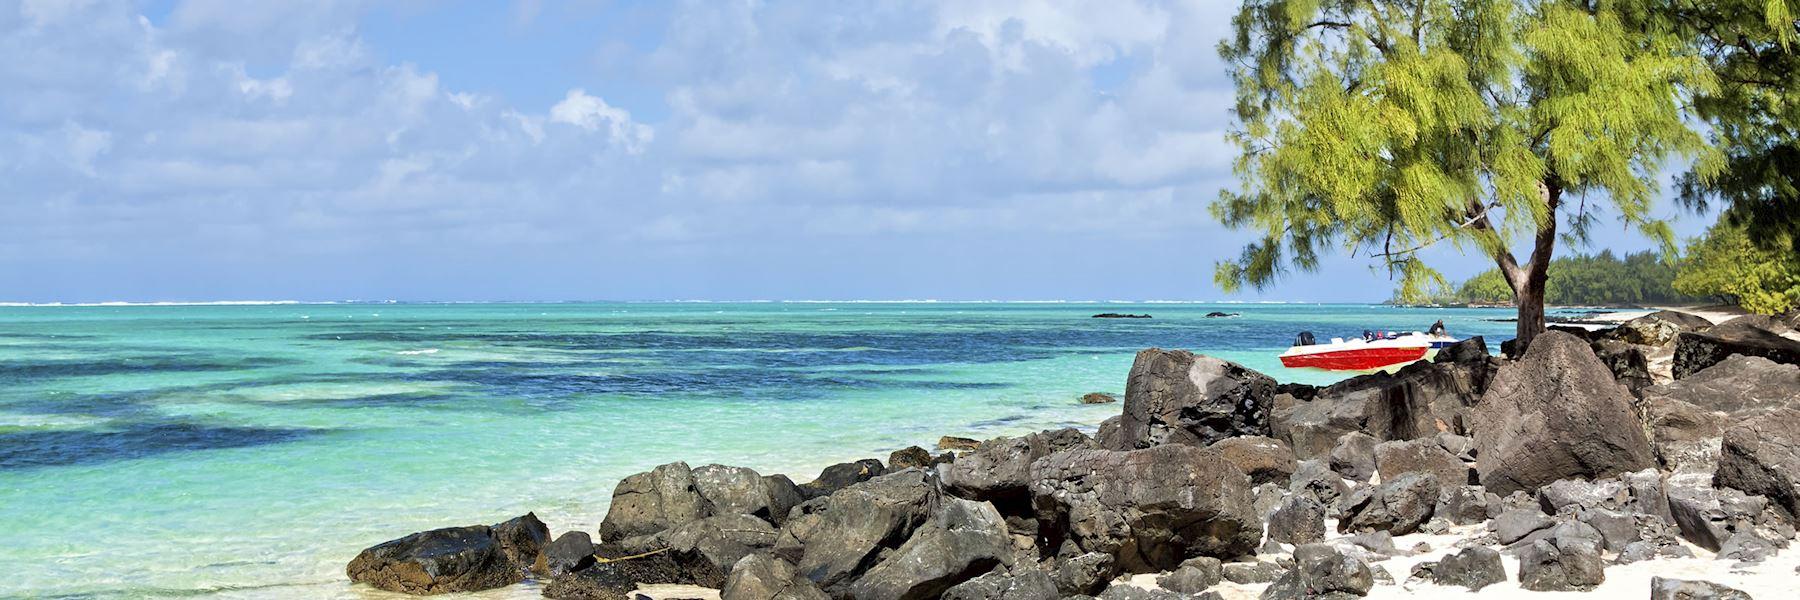 Mauritius travel guides